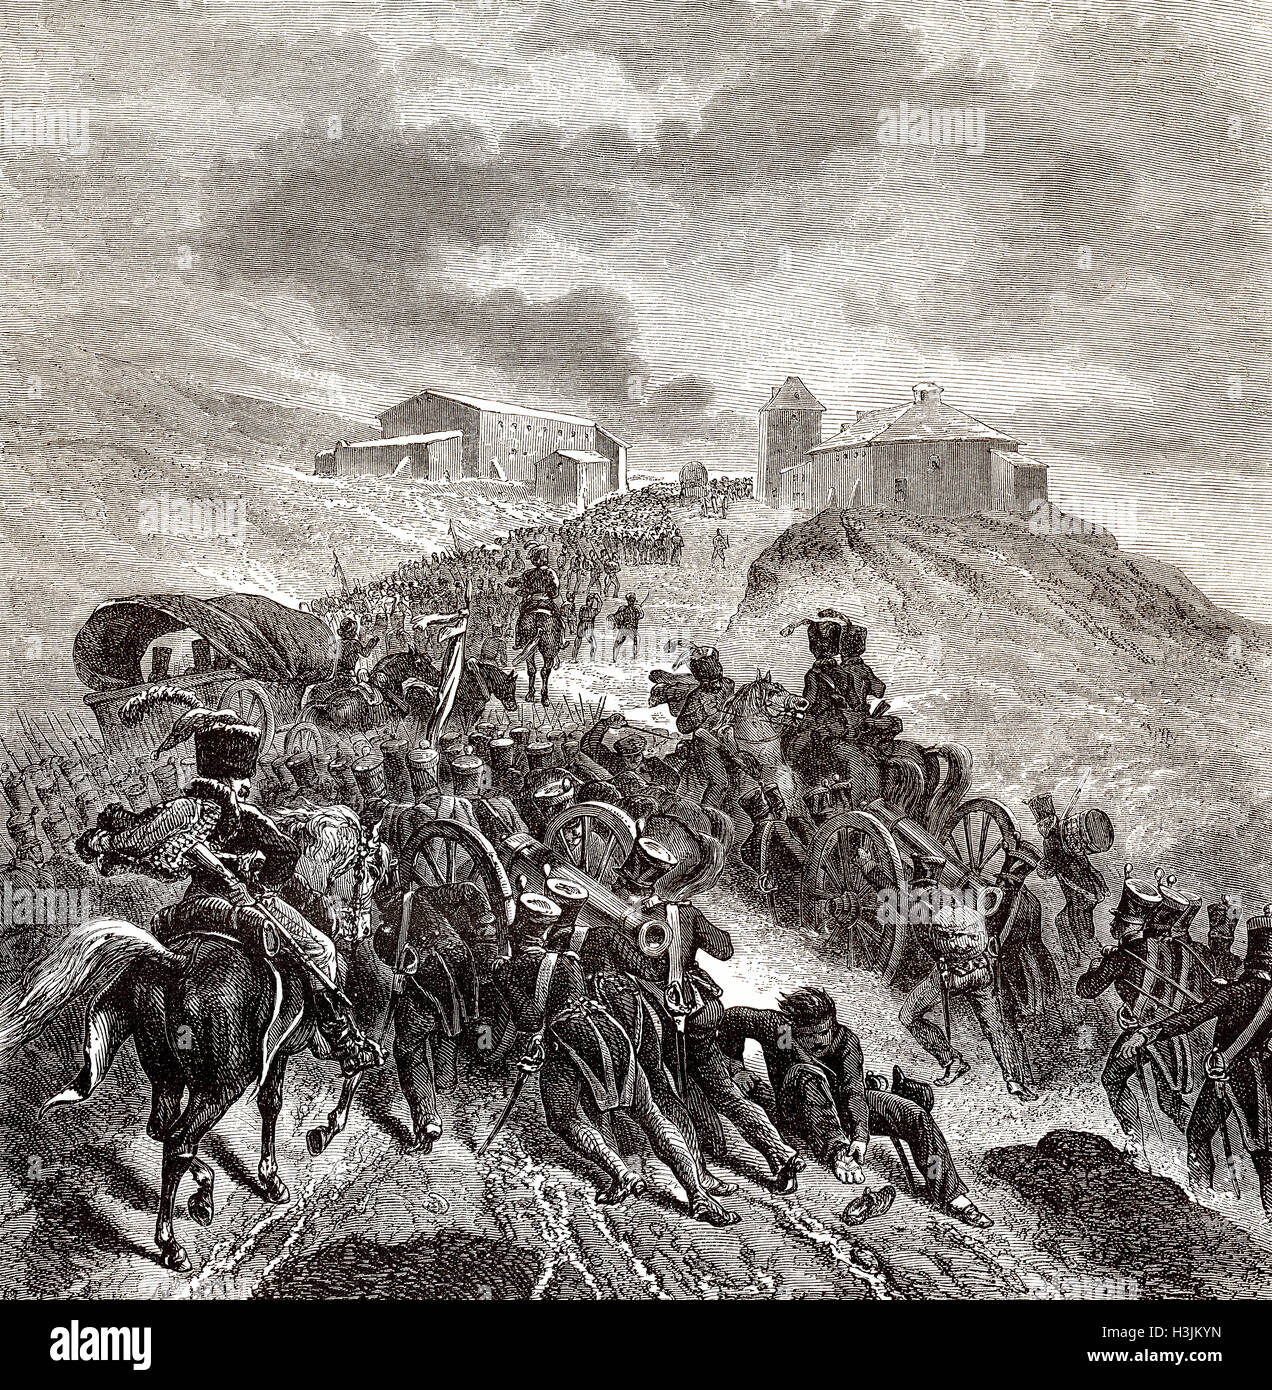 The Battle of Somosierra, November 30, 1808, Peninsular War - Stock Image